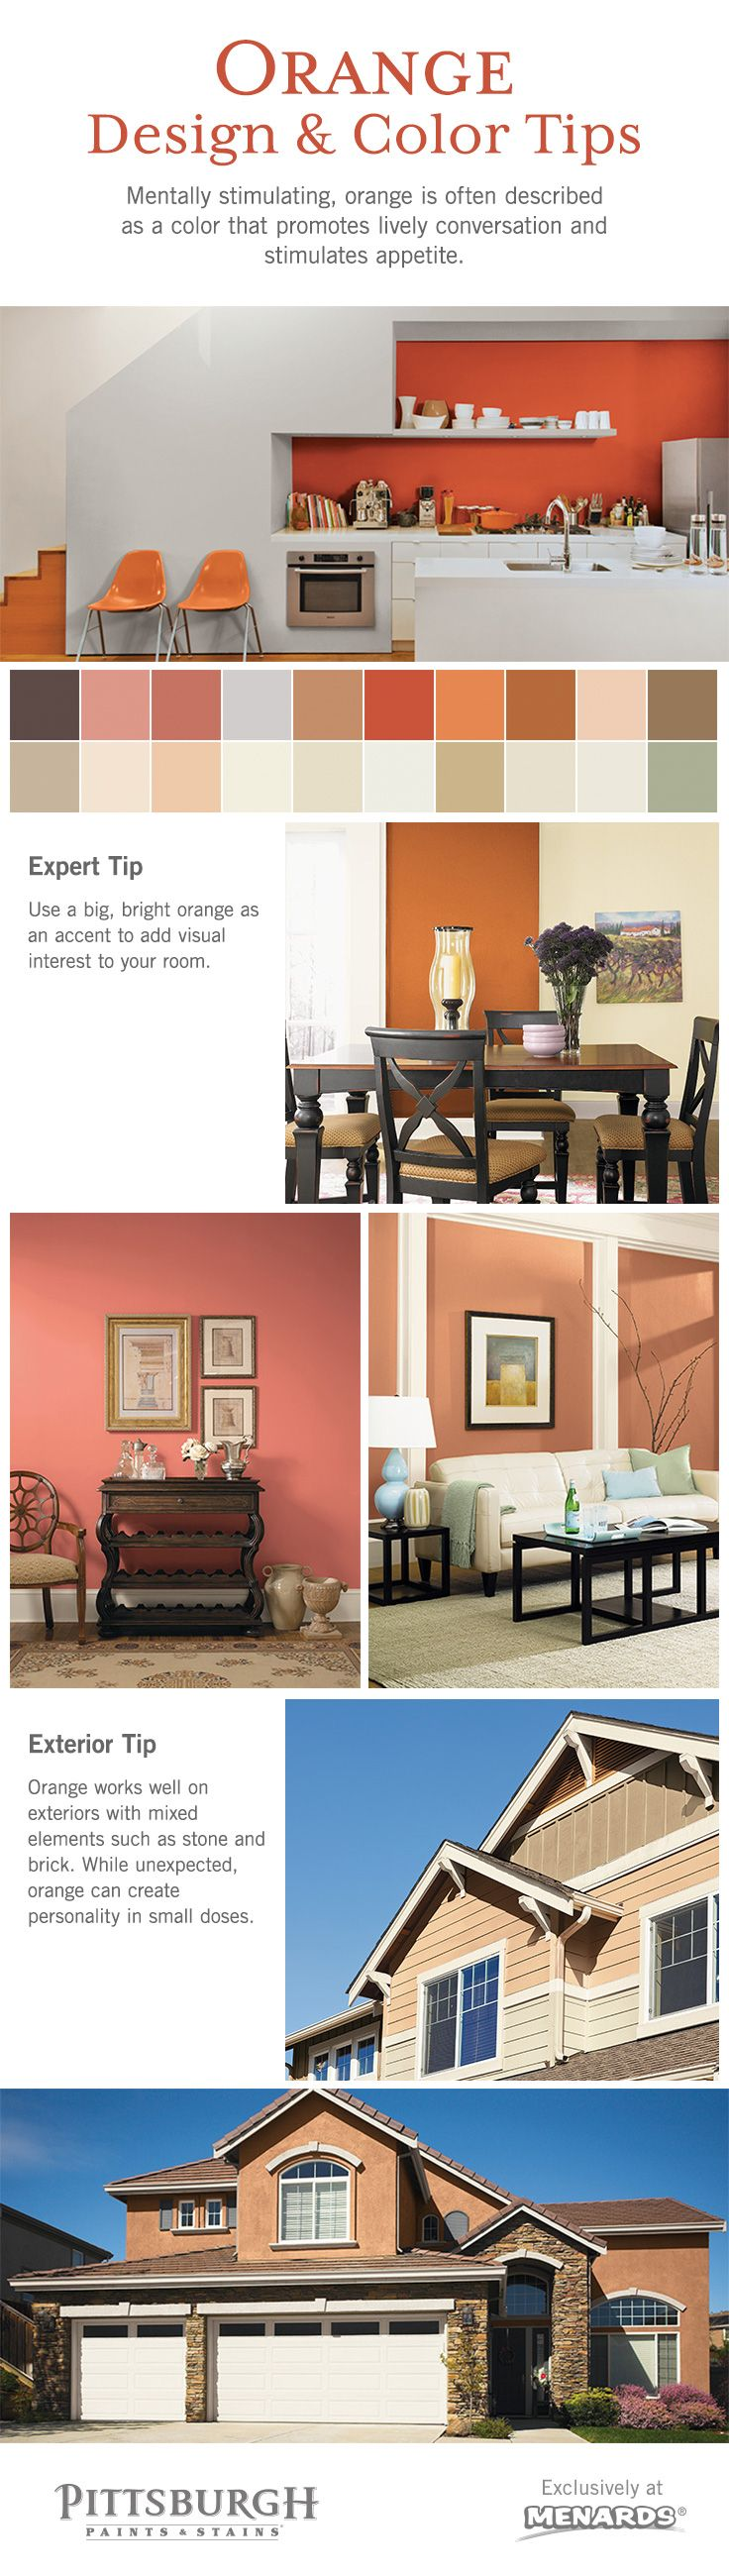 Orange color design inspiration by pittsburgh paints stains orange color design inspiration by pittsburgh paints stains at menards mentally geenschuldenfo Images